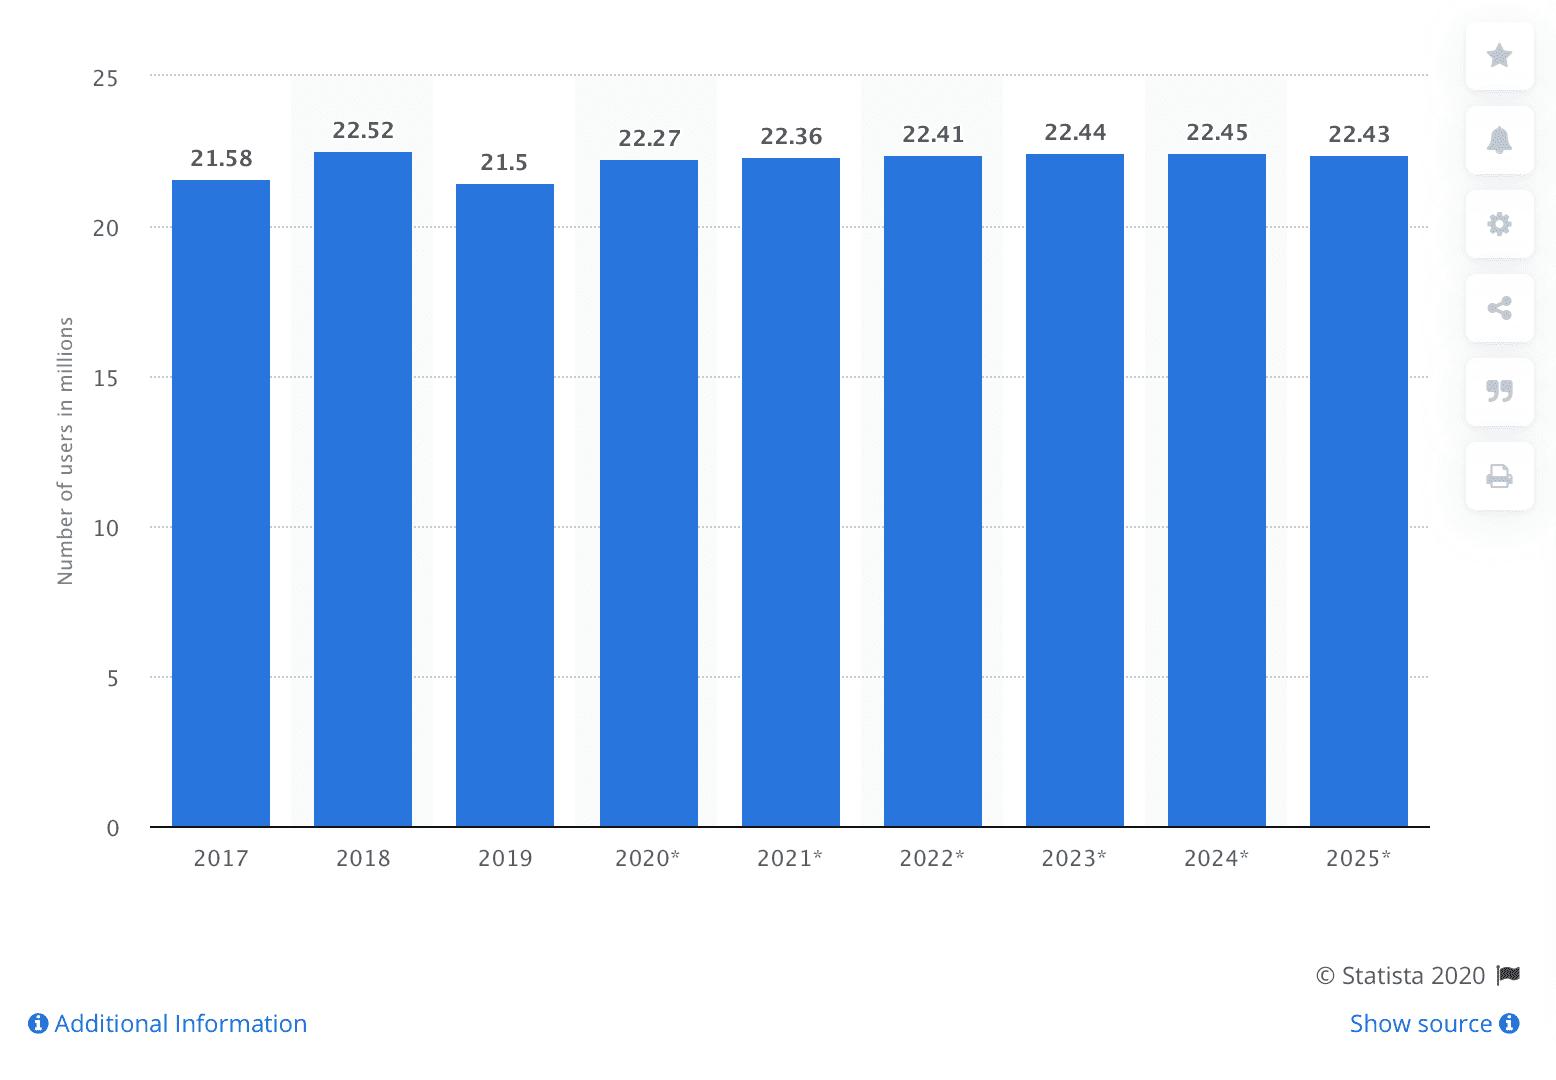 Facebookユーザーの傾向と予測